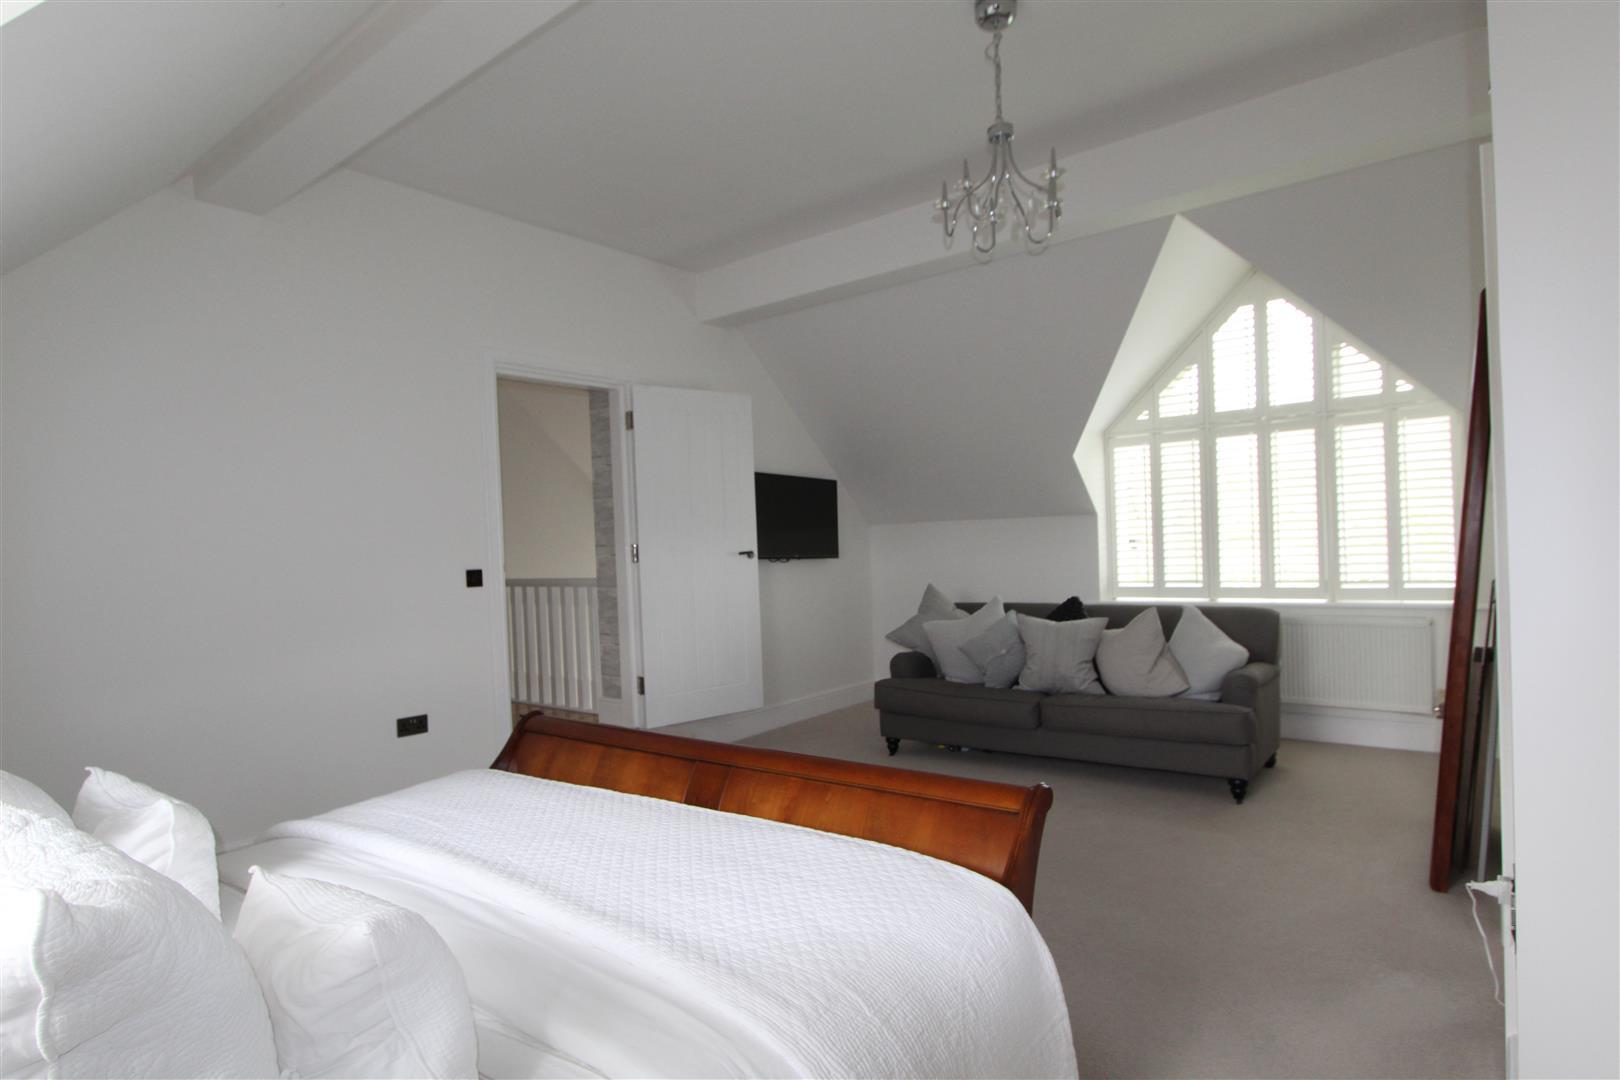 7 Bedroom Detached House For Sale In Belper